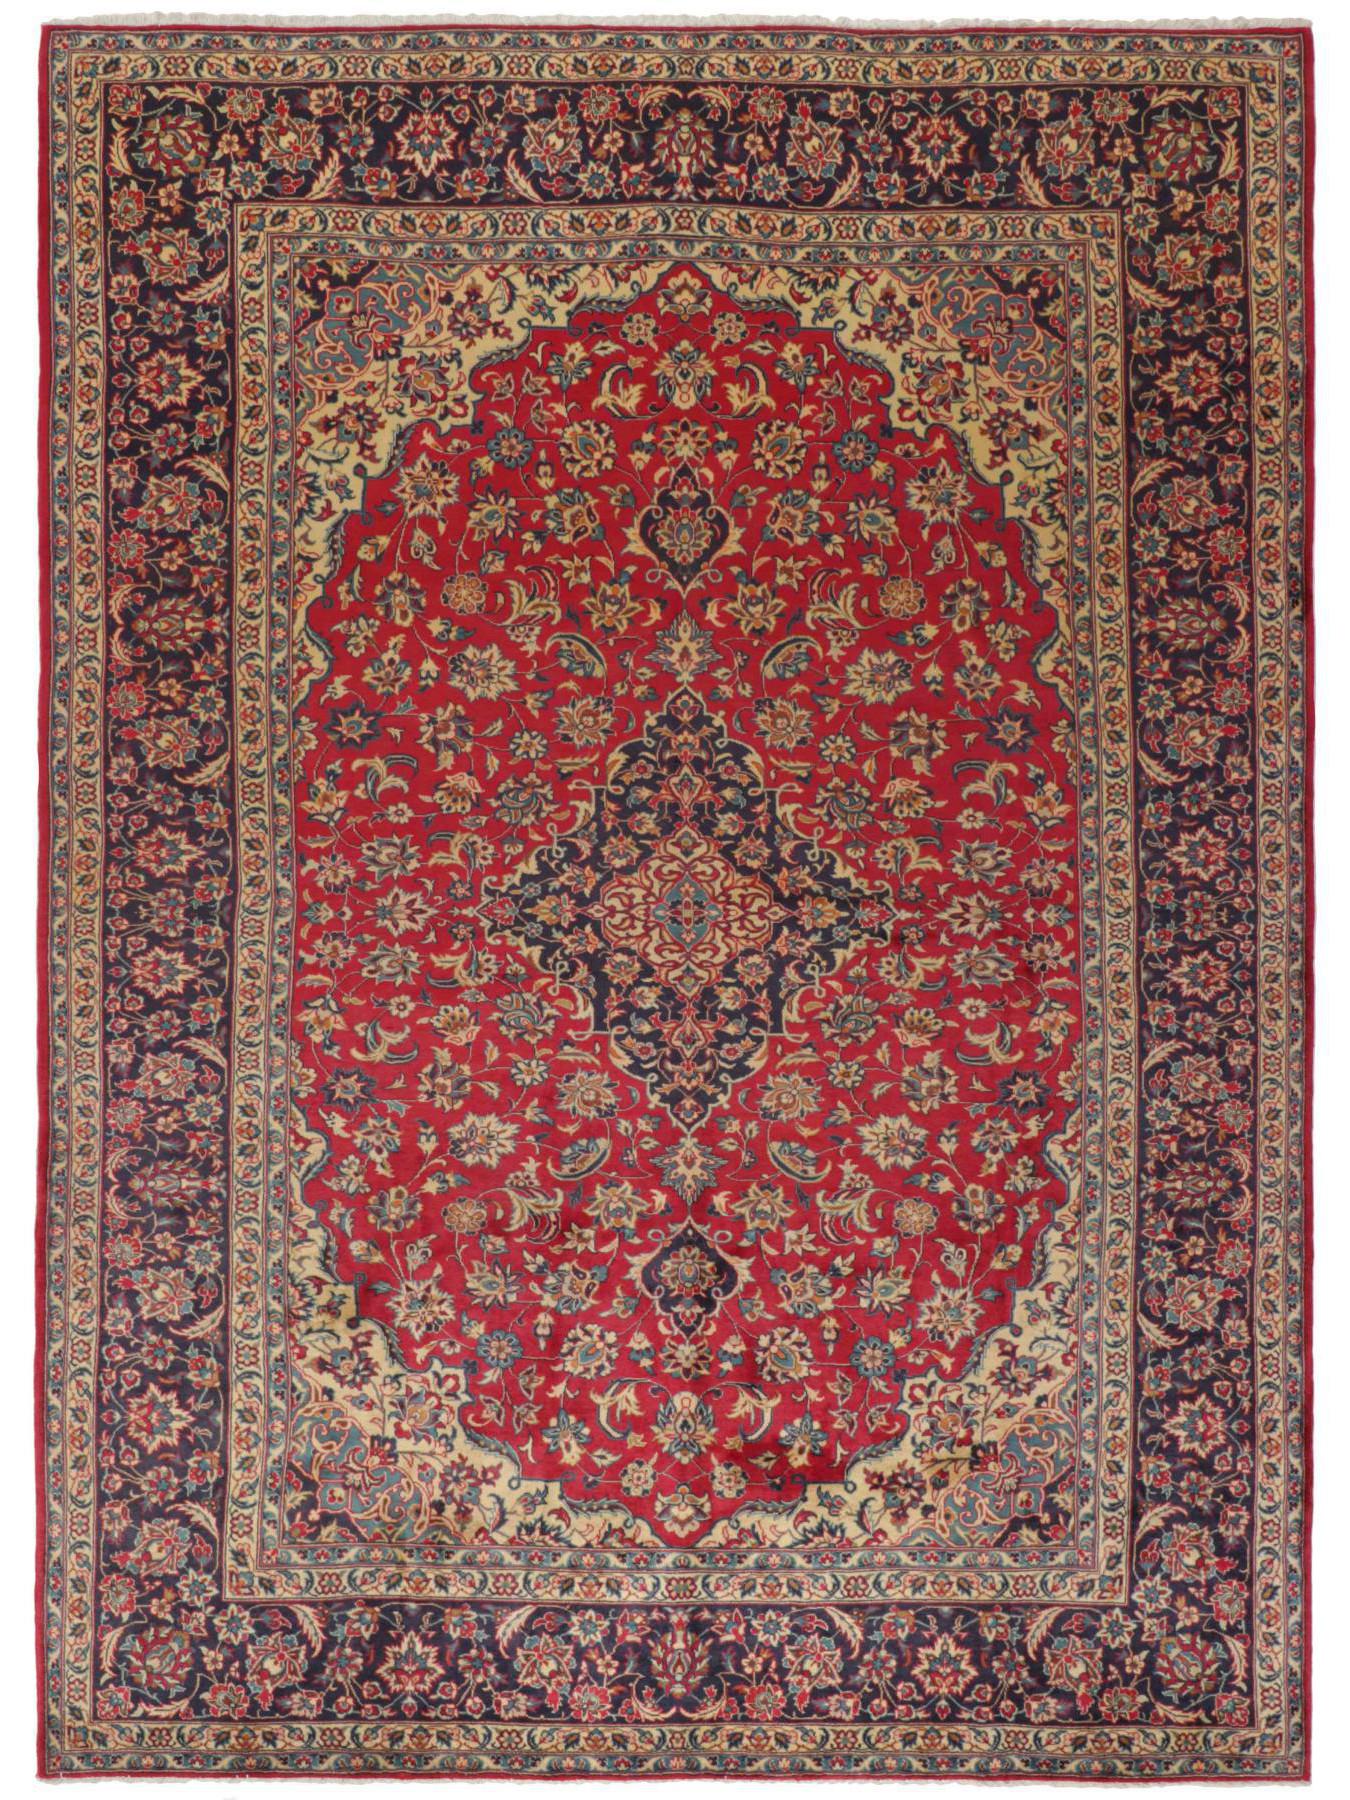 Tapis persans - Nadjafabad